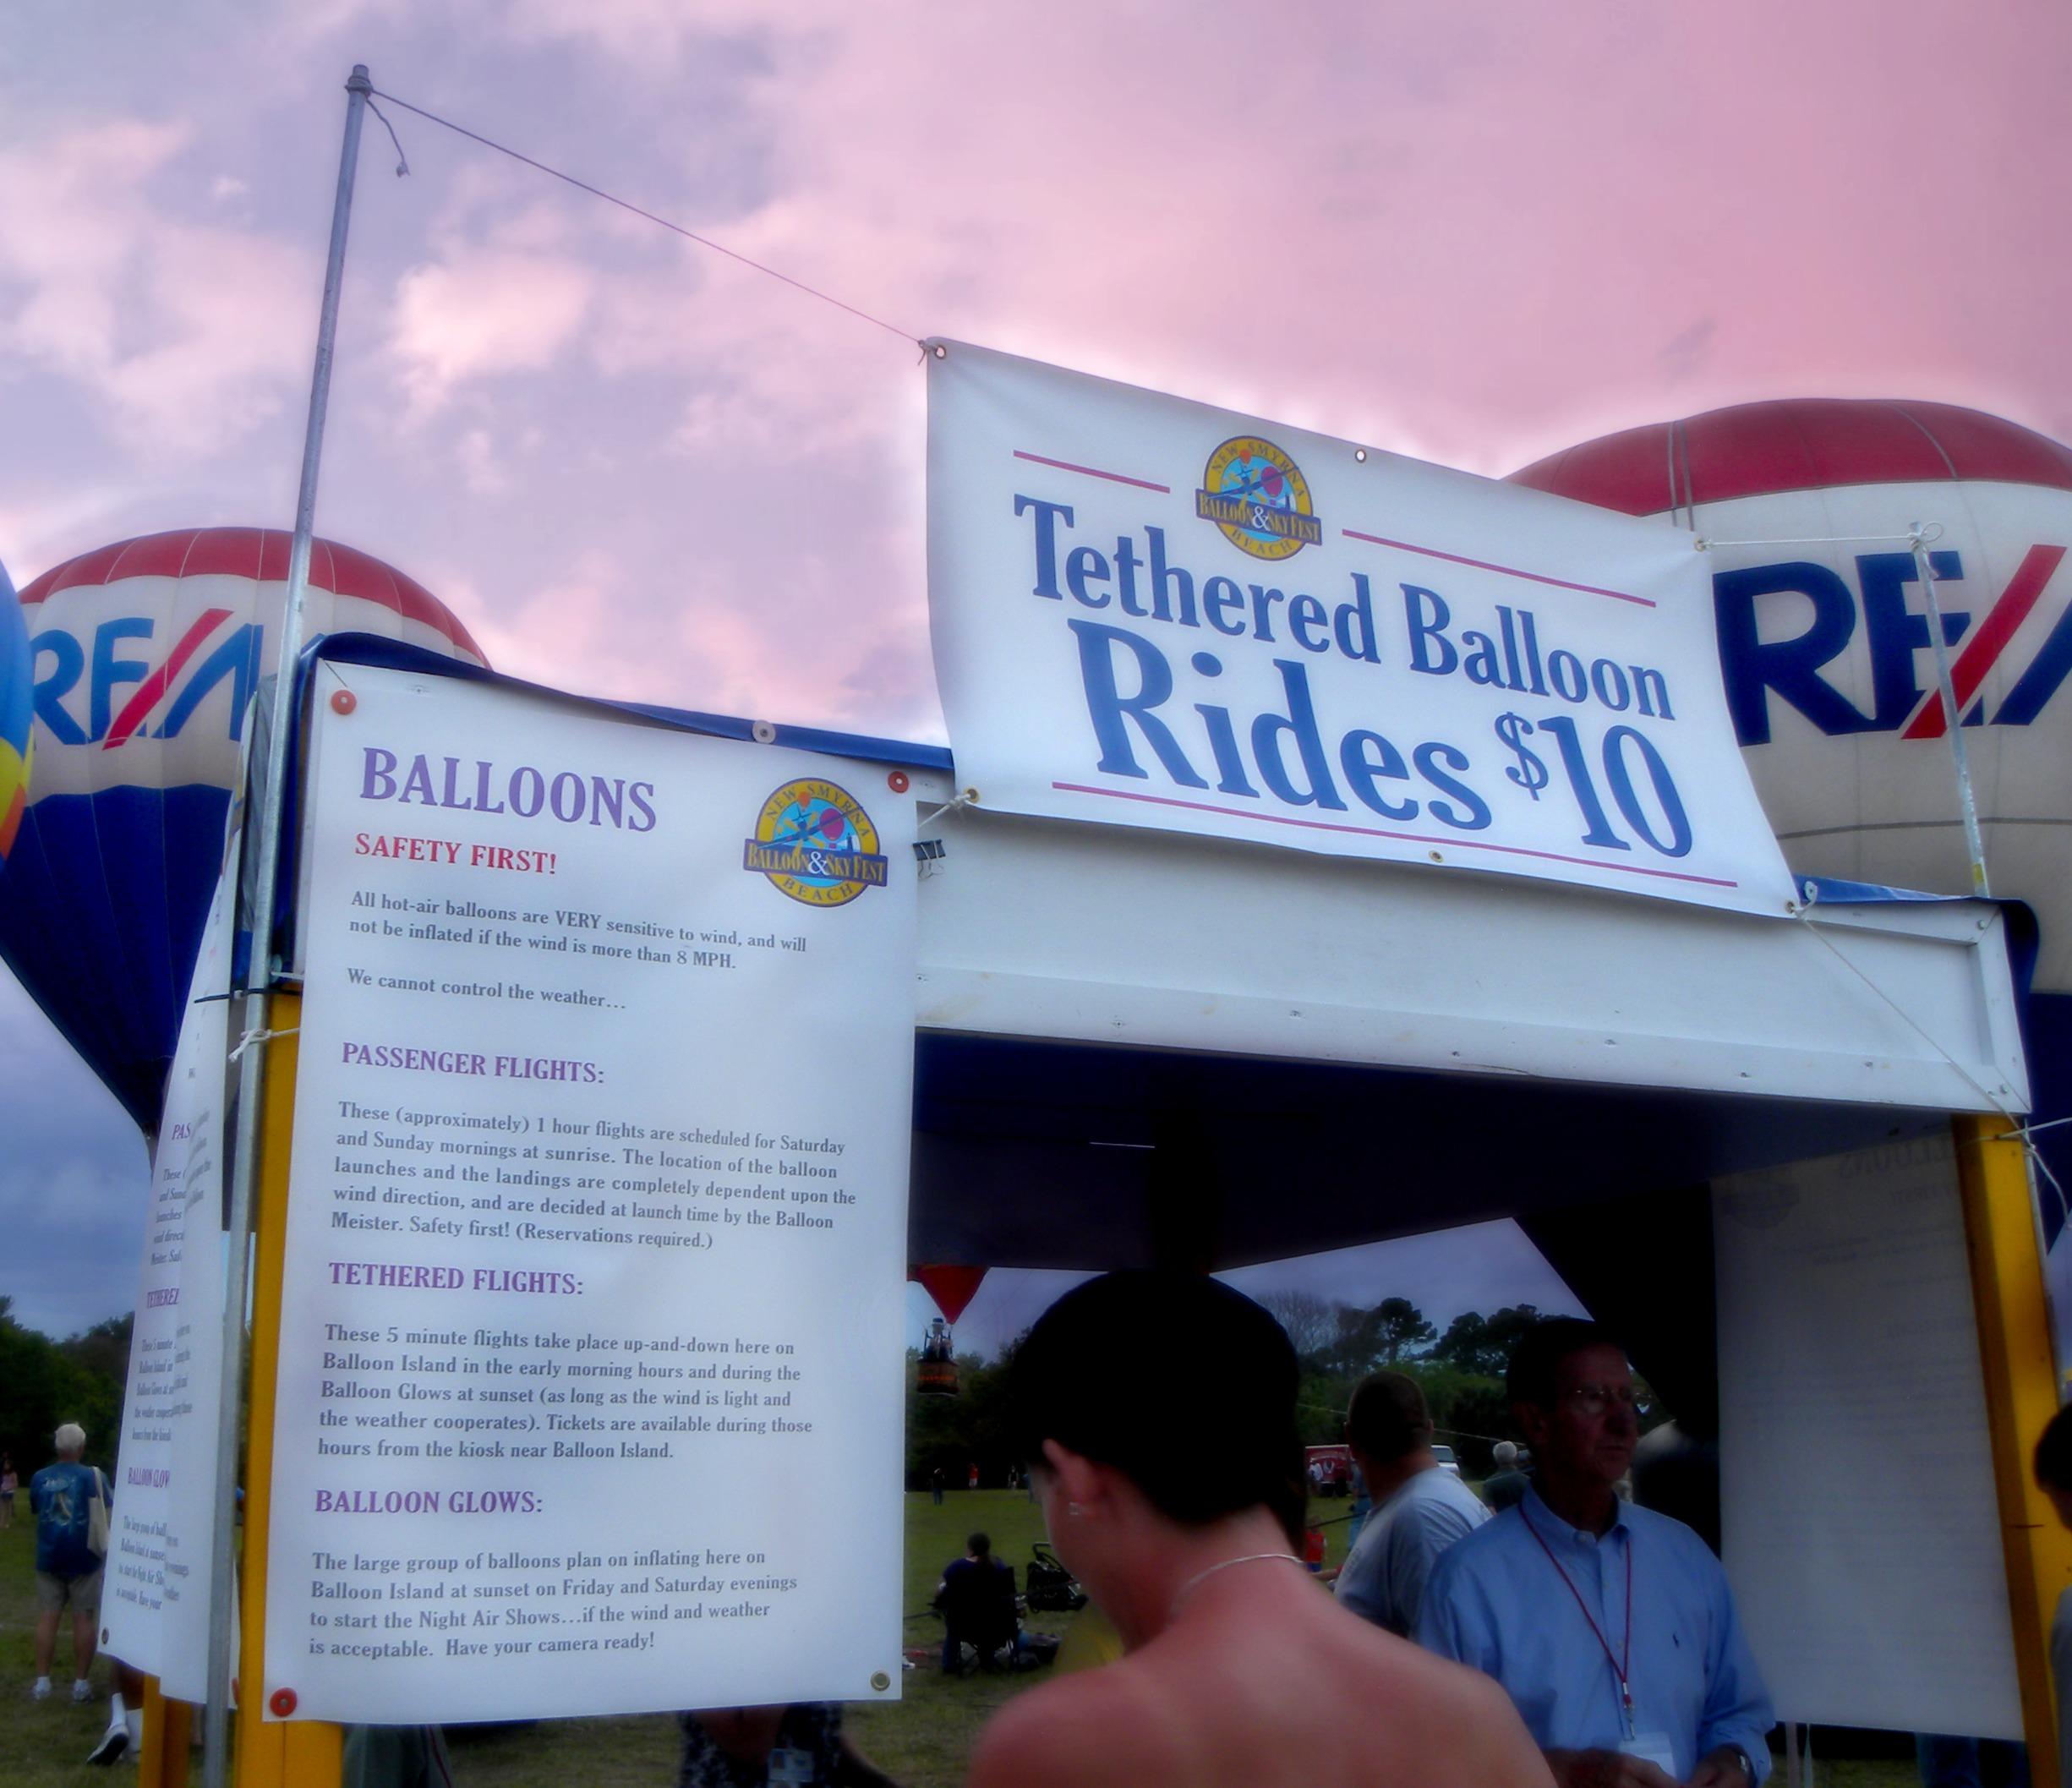 tethered ballon rides